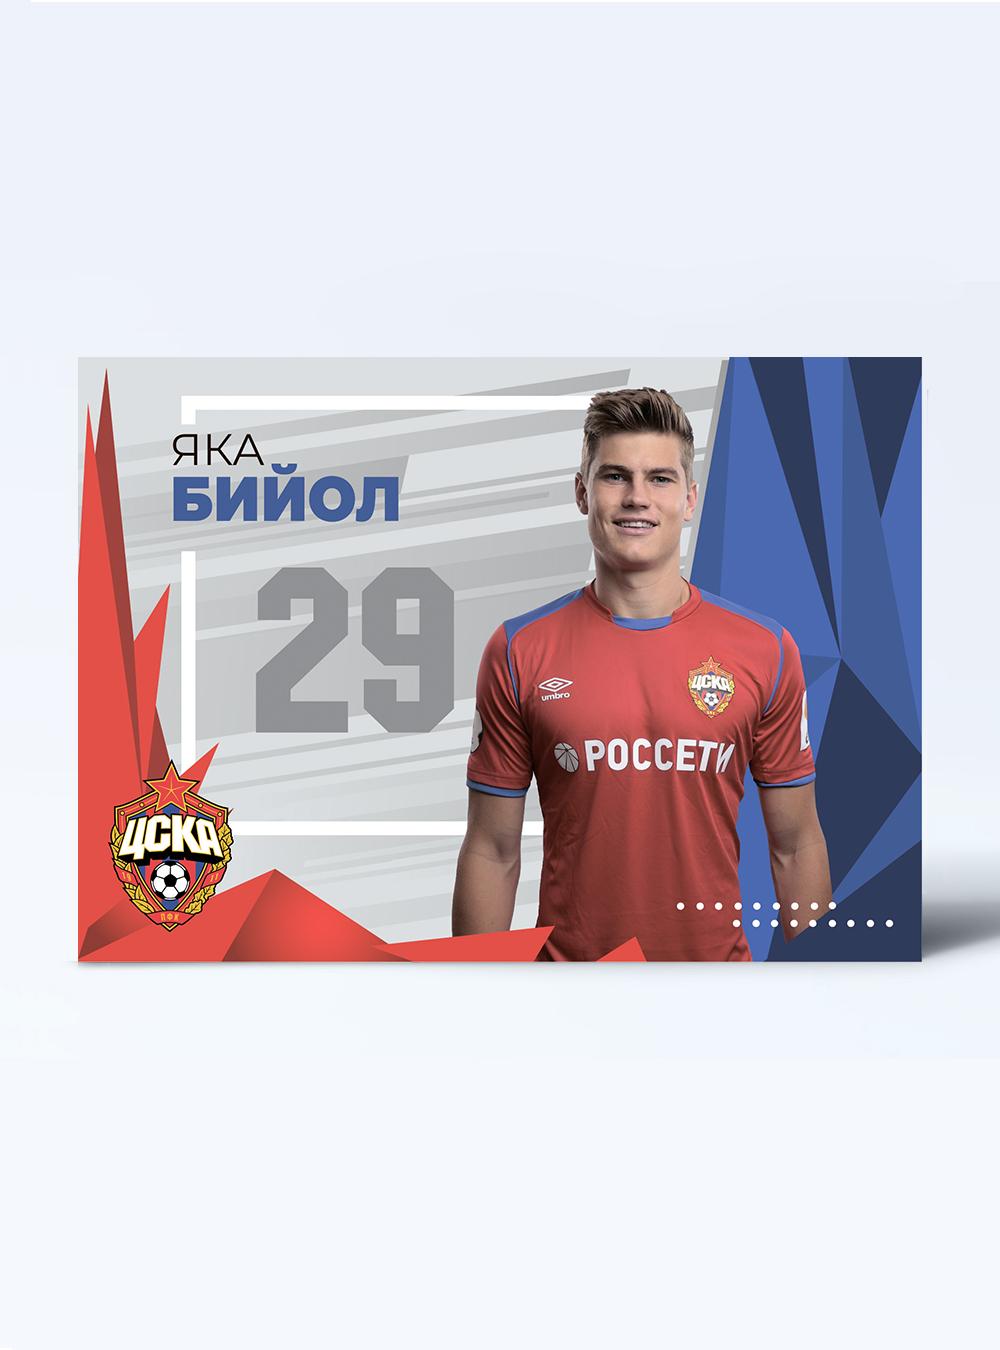 Карточка для автографа Бийол 2019/2020 фото